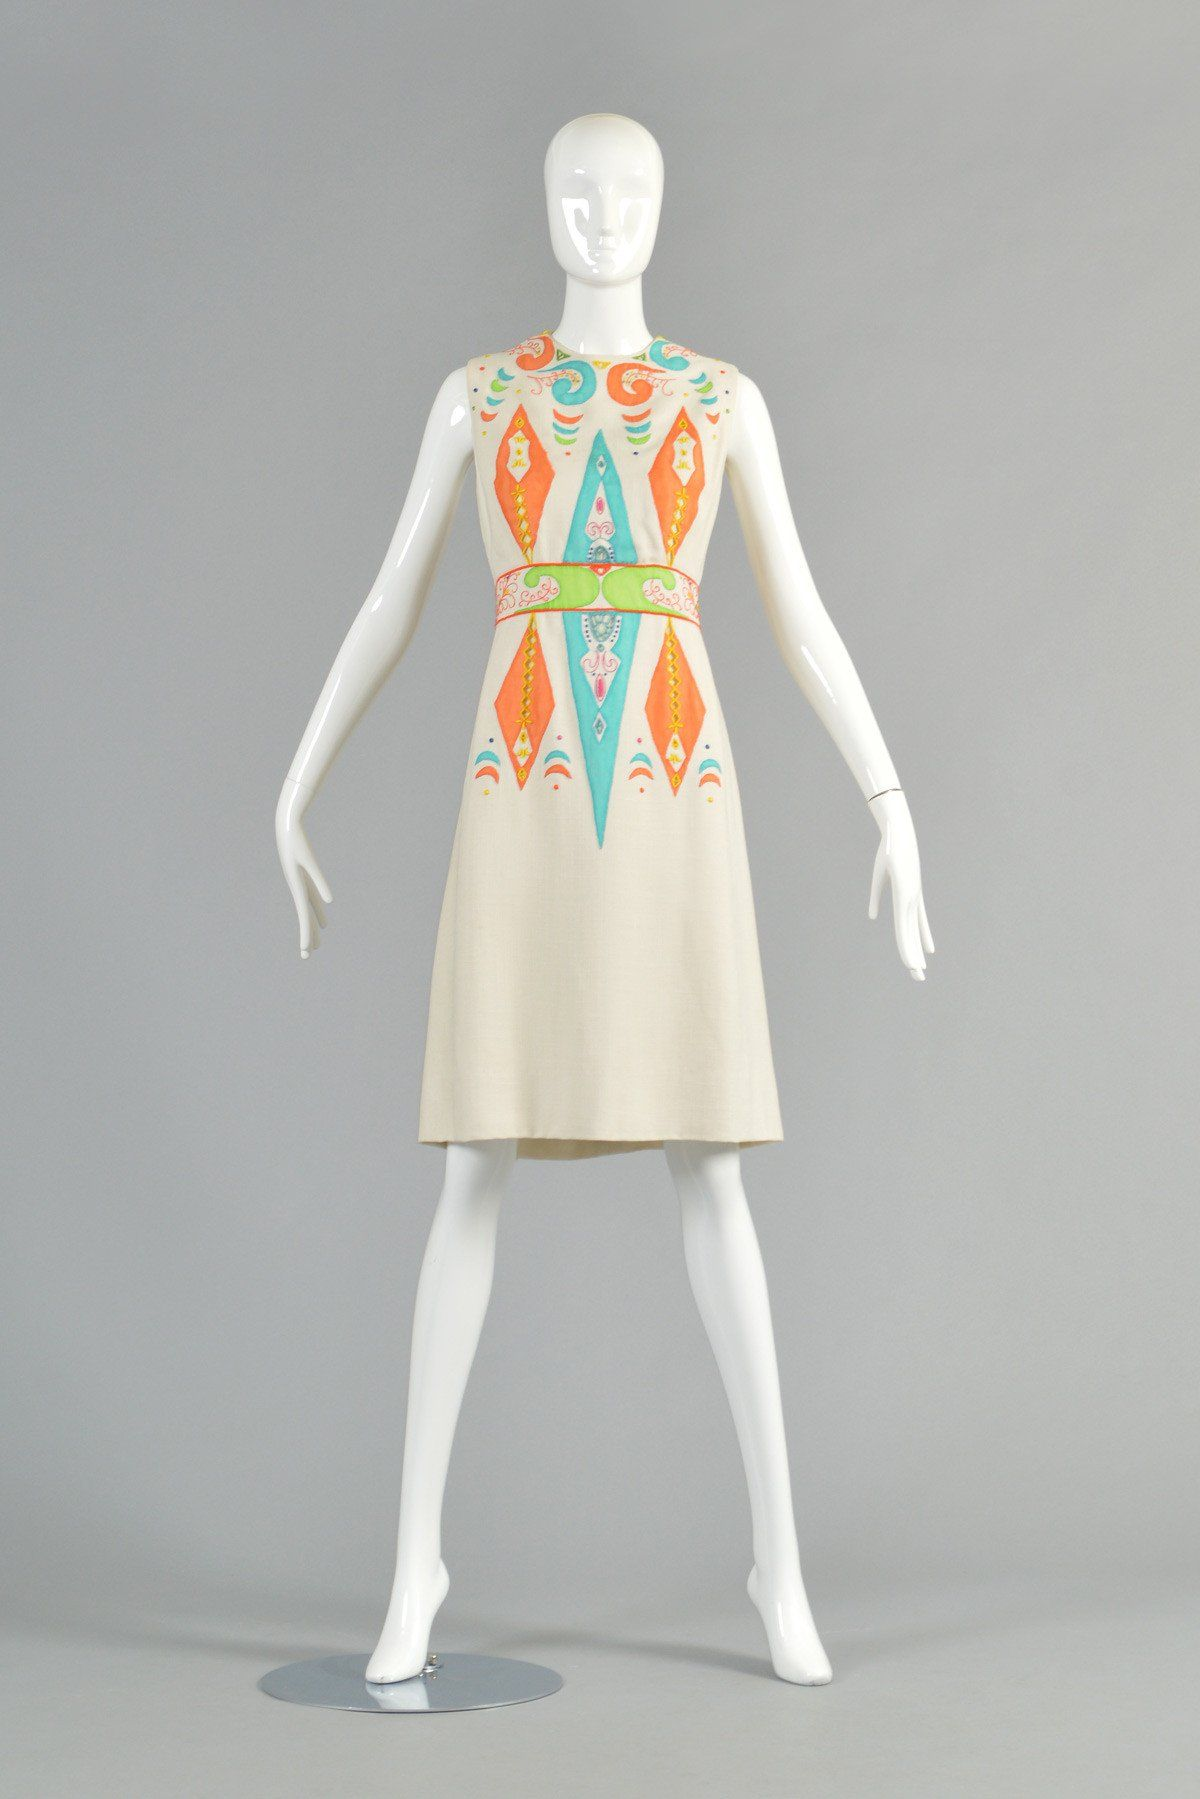 Meilleur De Robe De Chambre Satin Femme Artamplitude